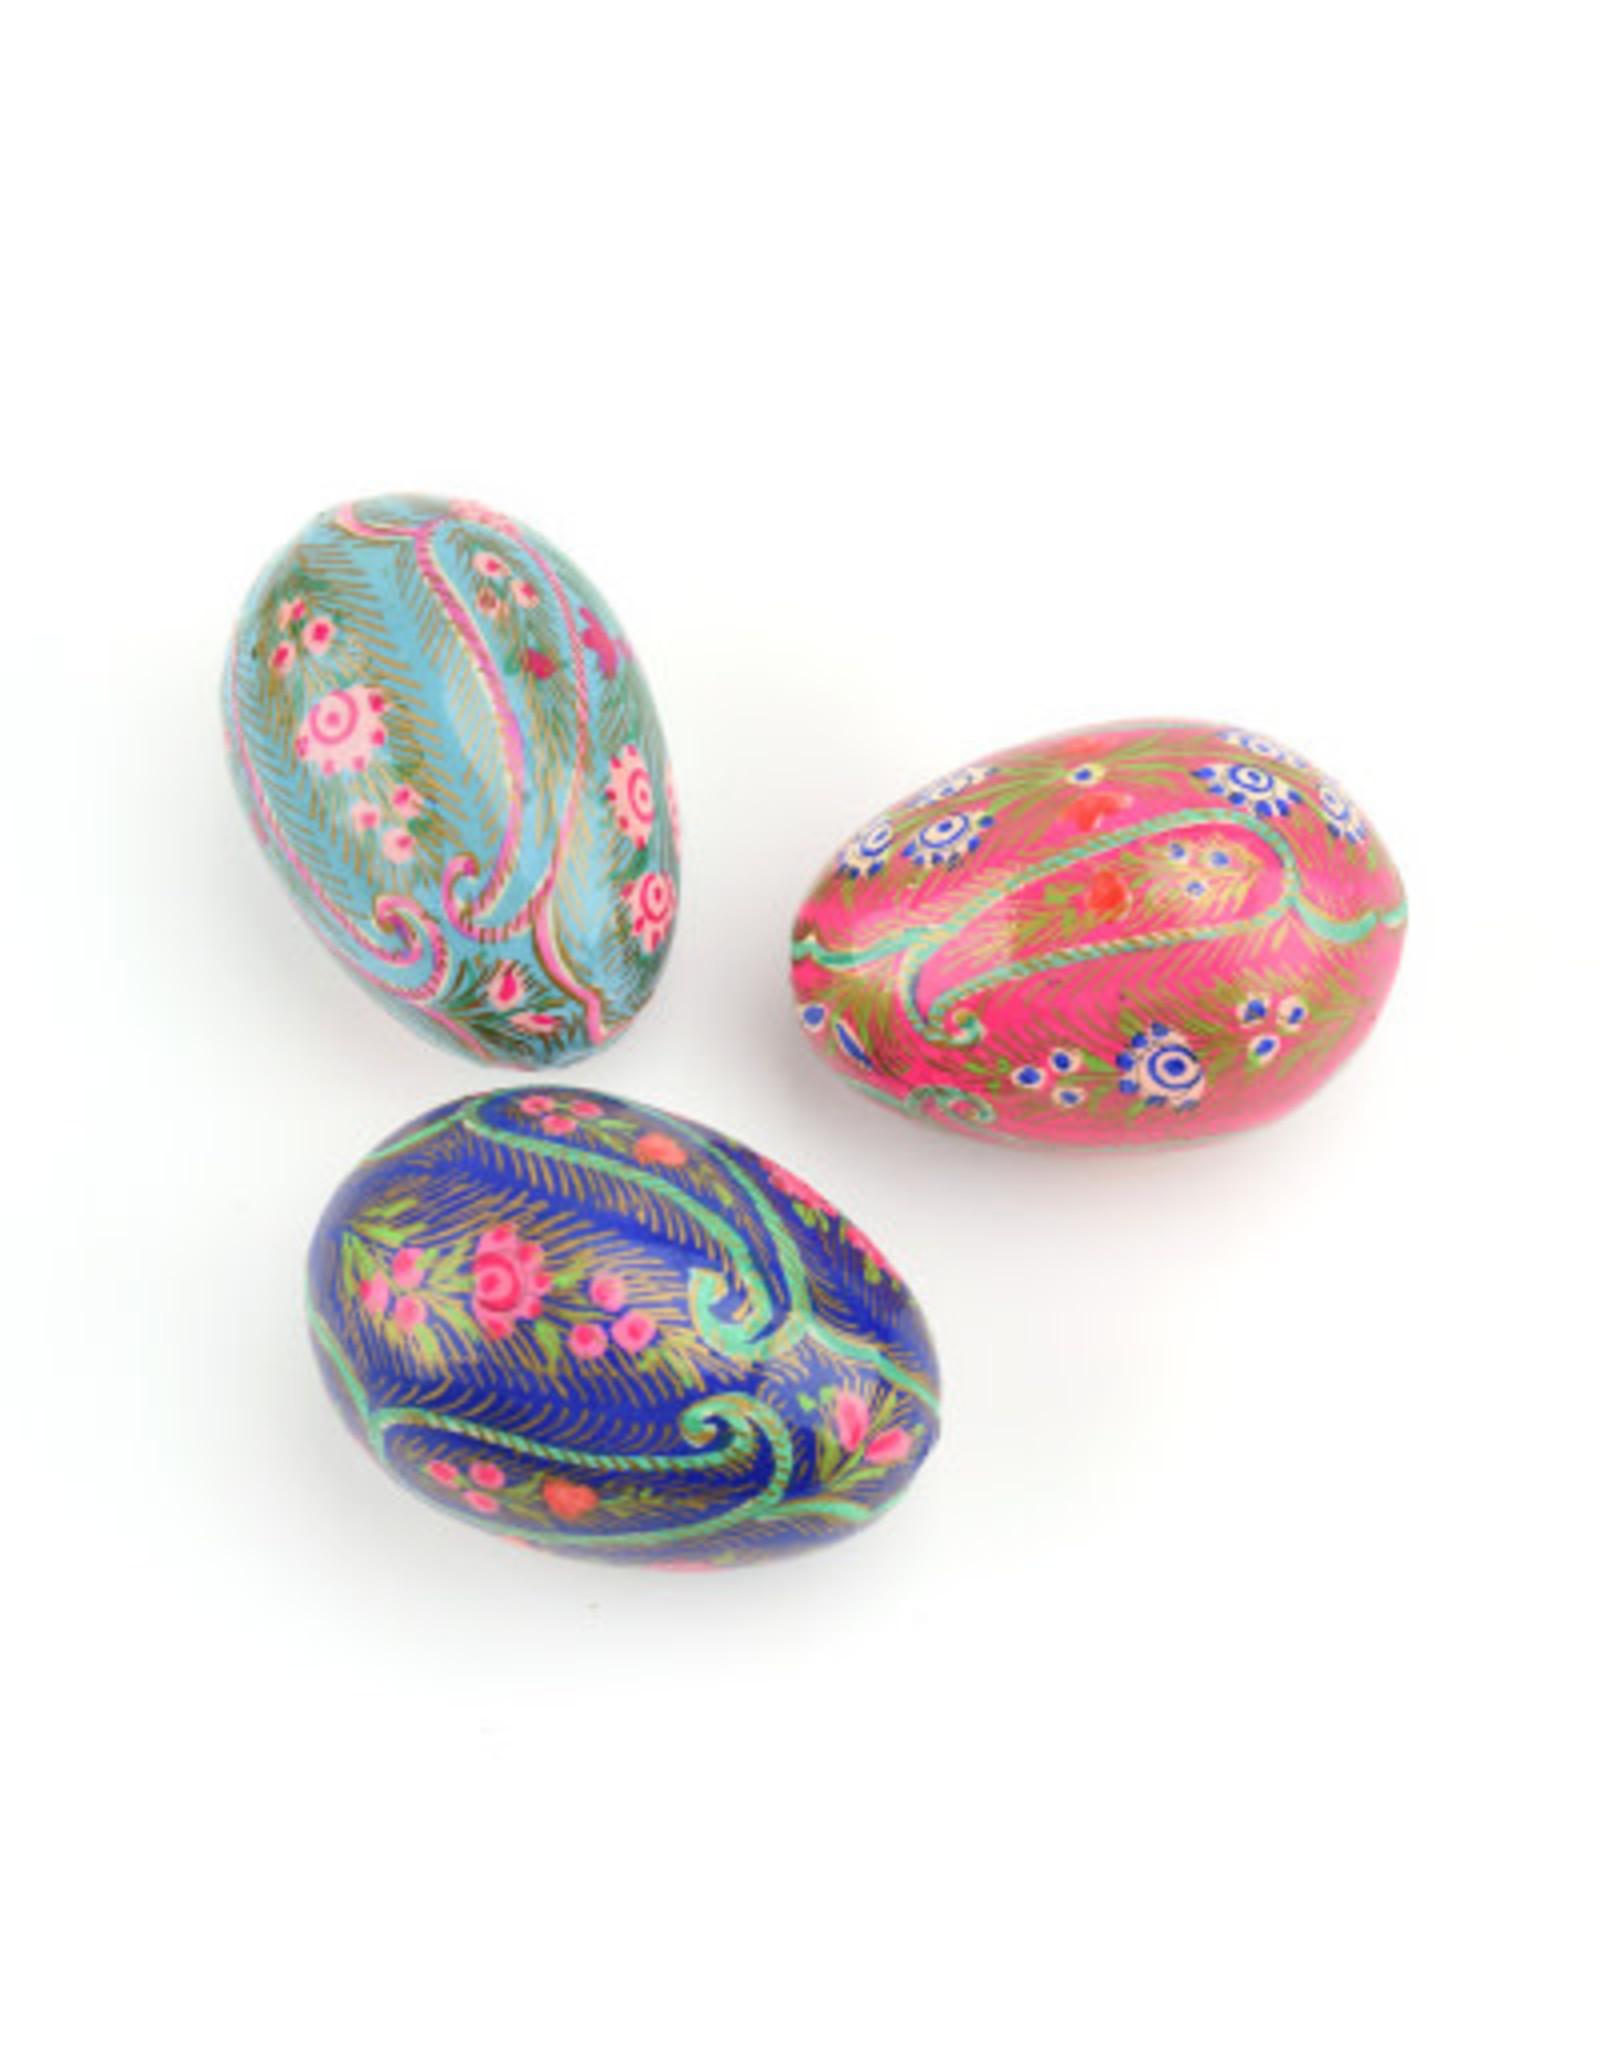 Feathered Paisley Kashmiri Eggs, India